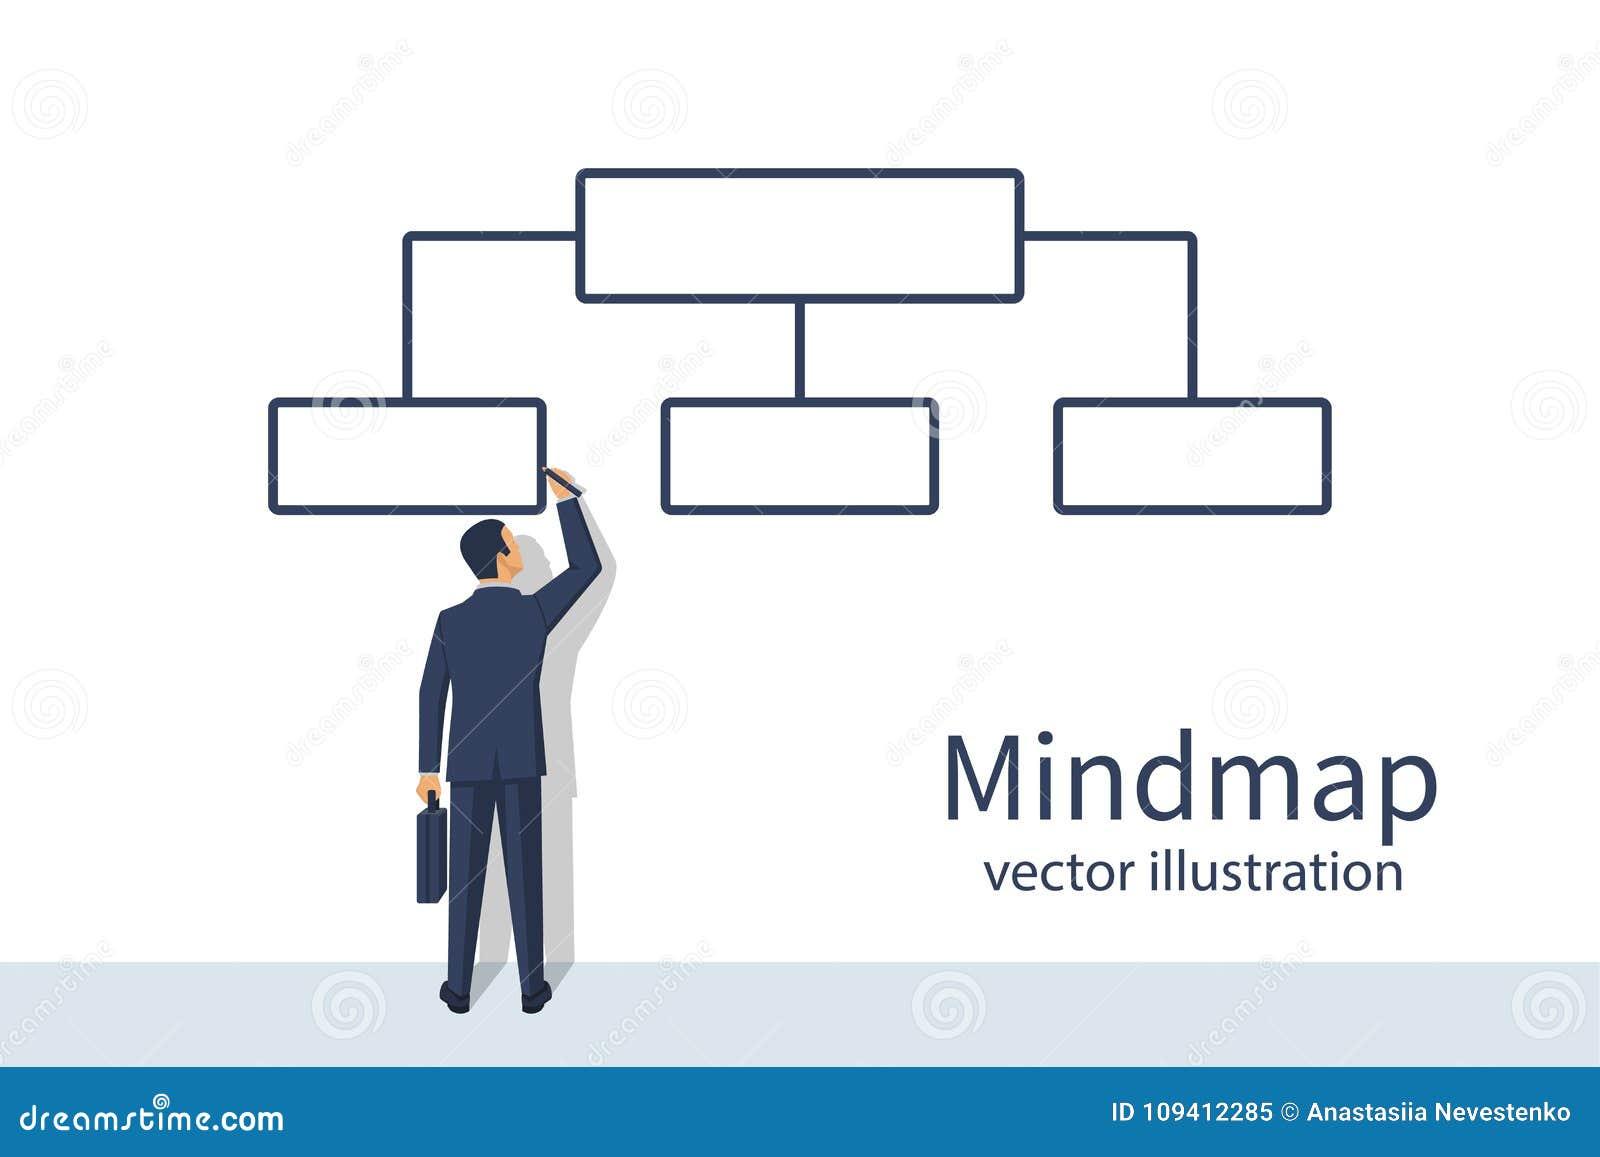 Mindmap. Businessman standing by the wall draws flowchart.